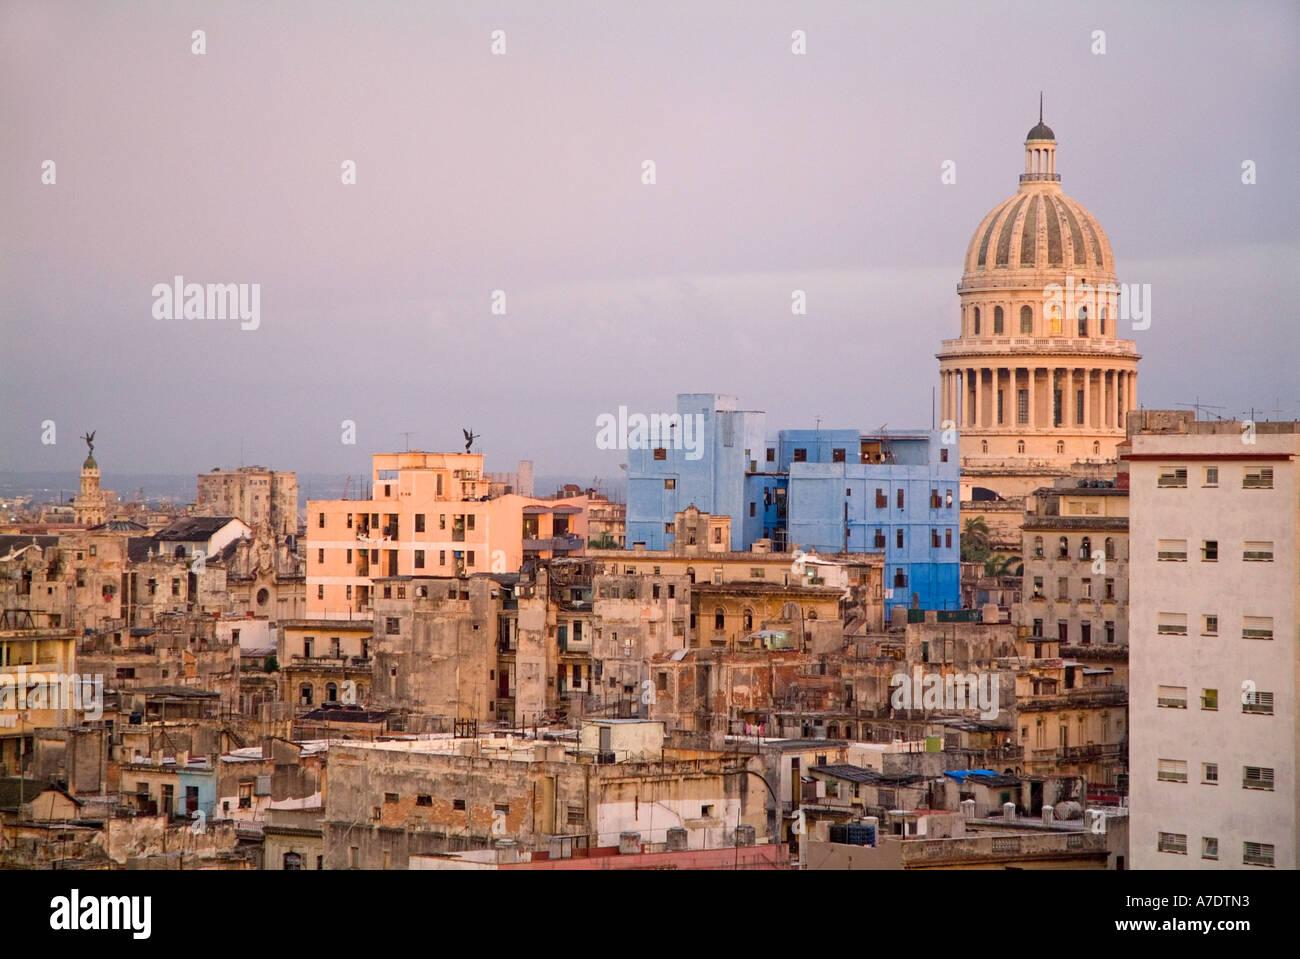 Havana, Cuba - at sunset / dusk - Stock Image